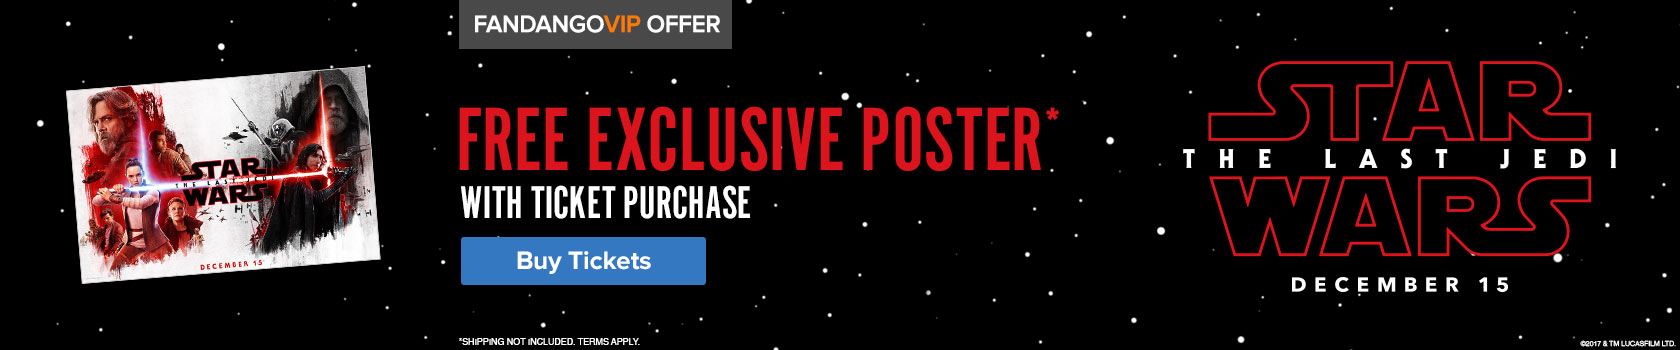 Fandango Star Wars The Last Jedi Gift with Purchase